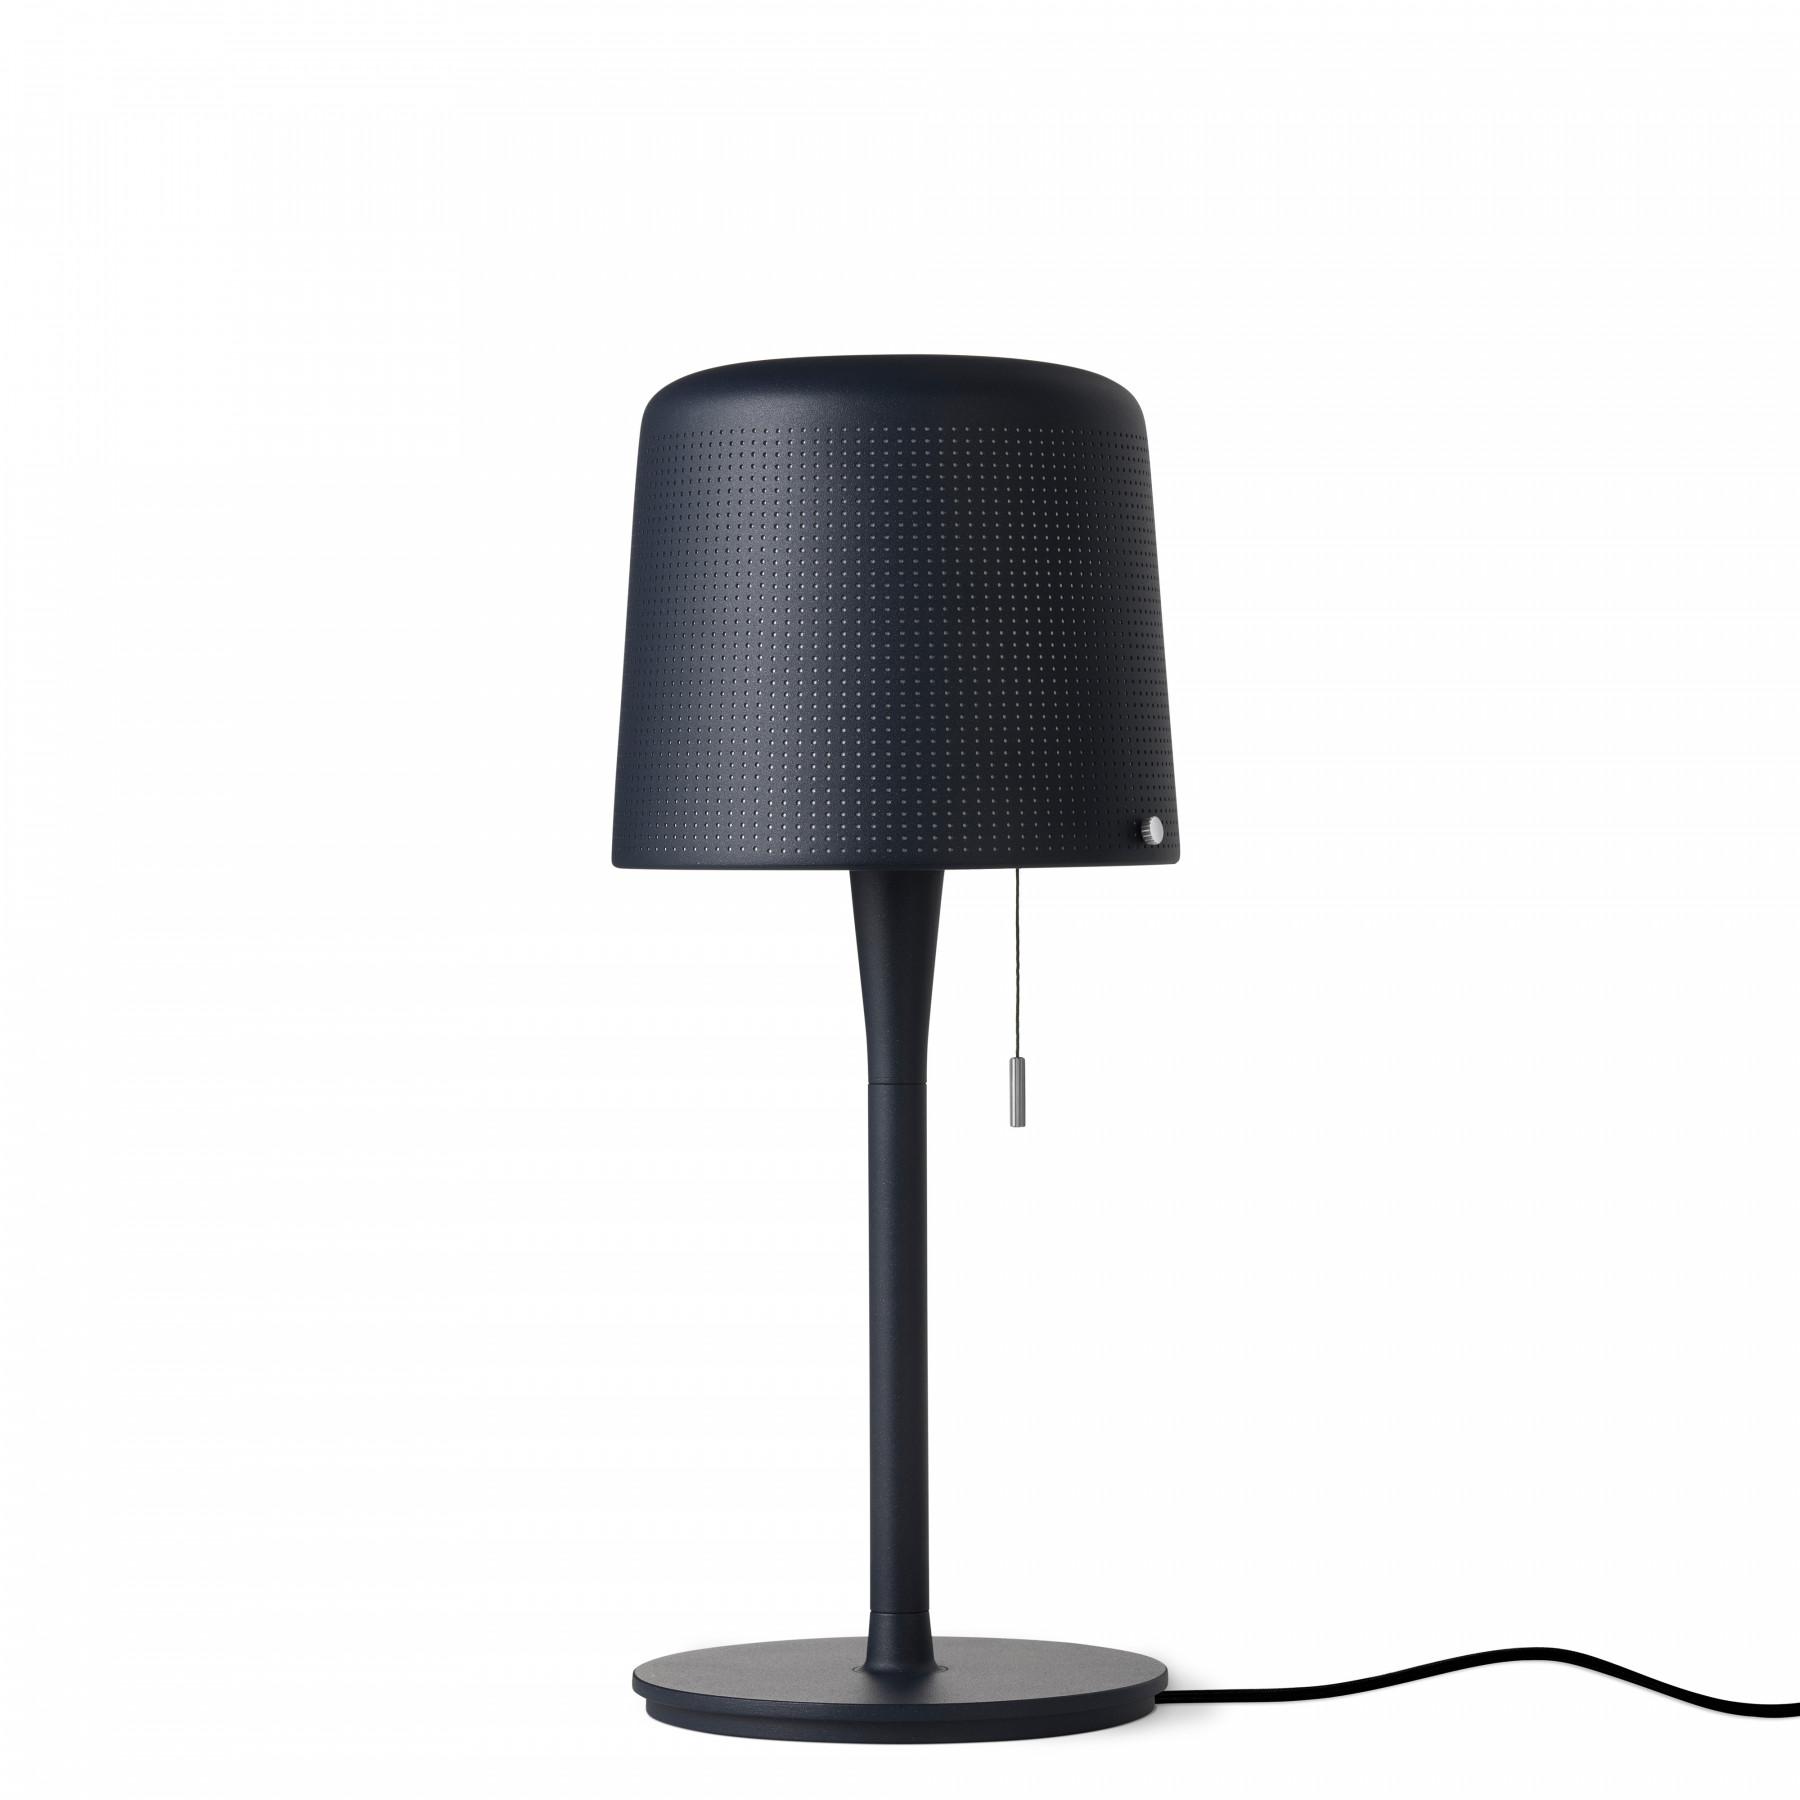 vipp Table Lamp Dark Blue VIPP530, 53050EU, 5705953168306